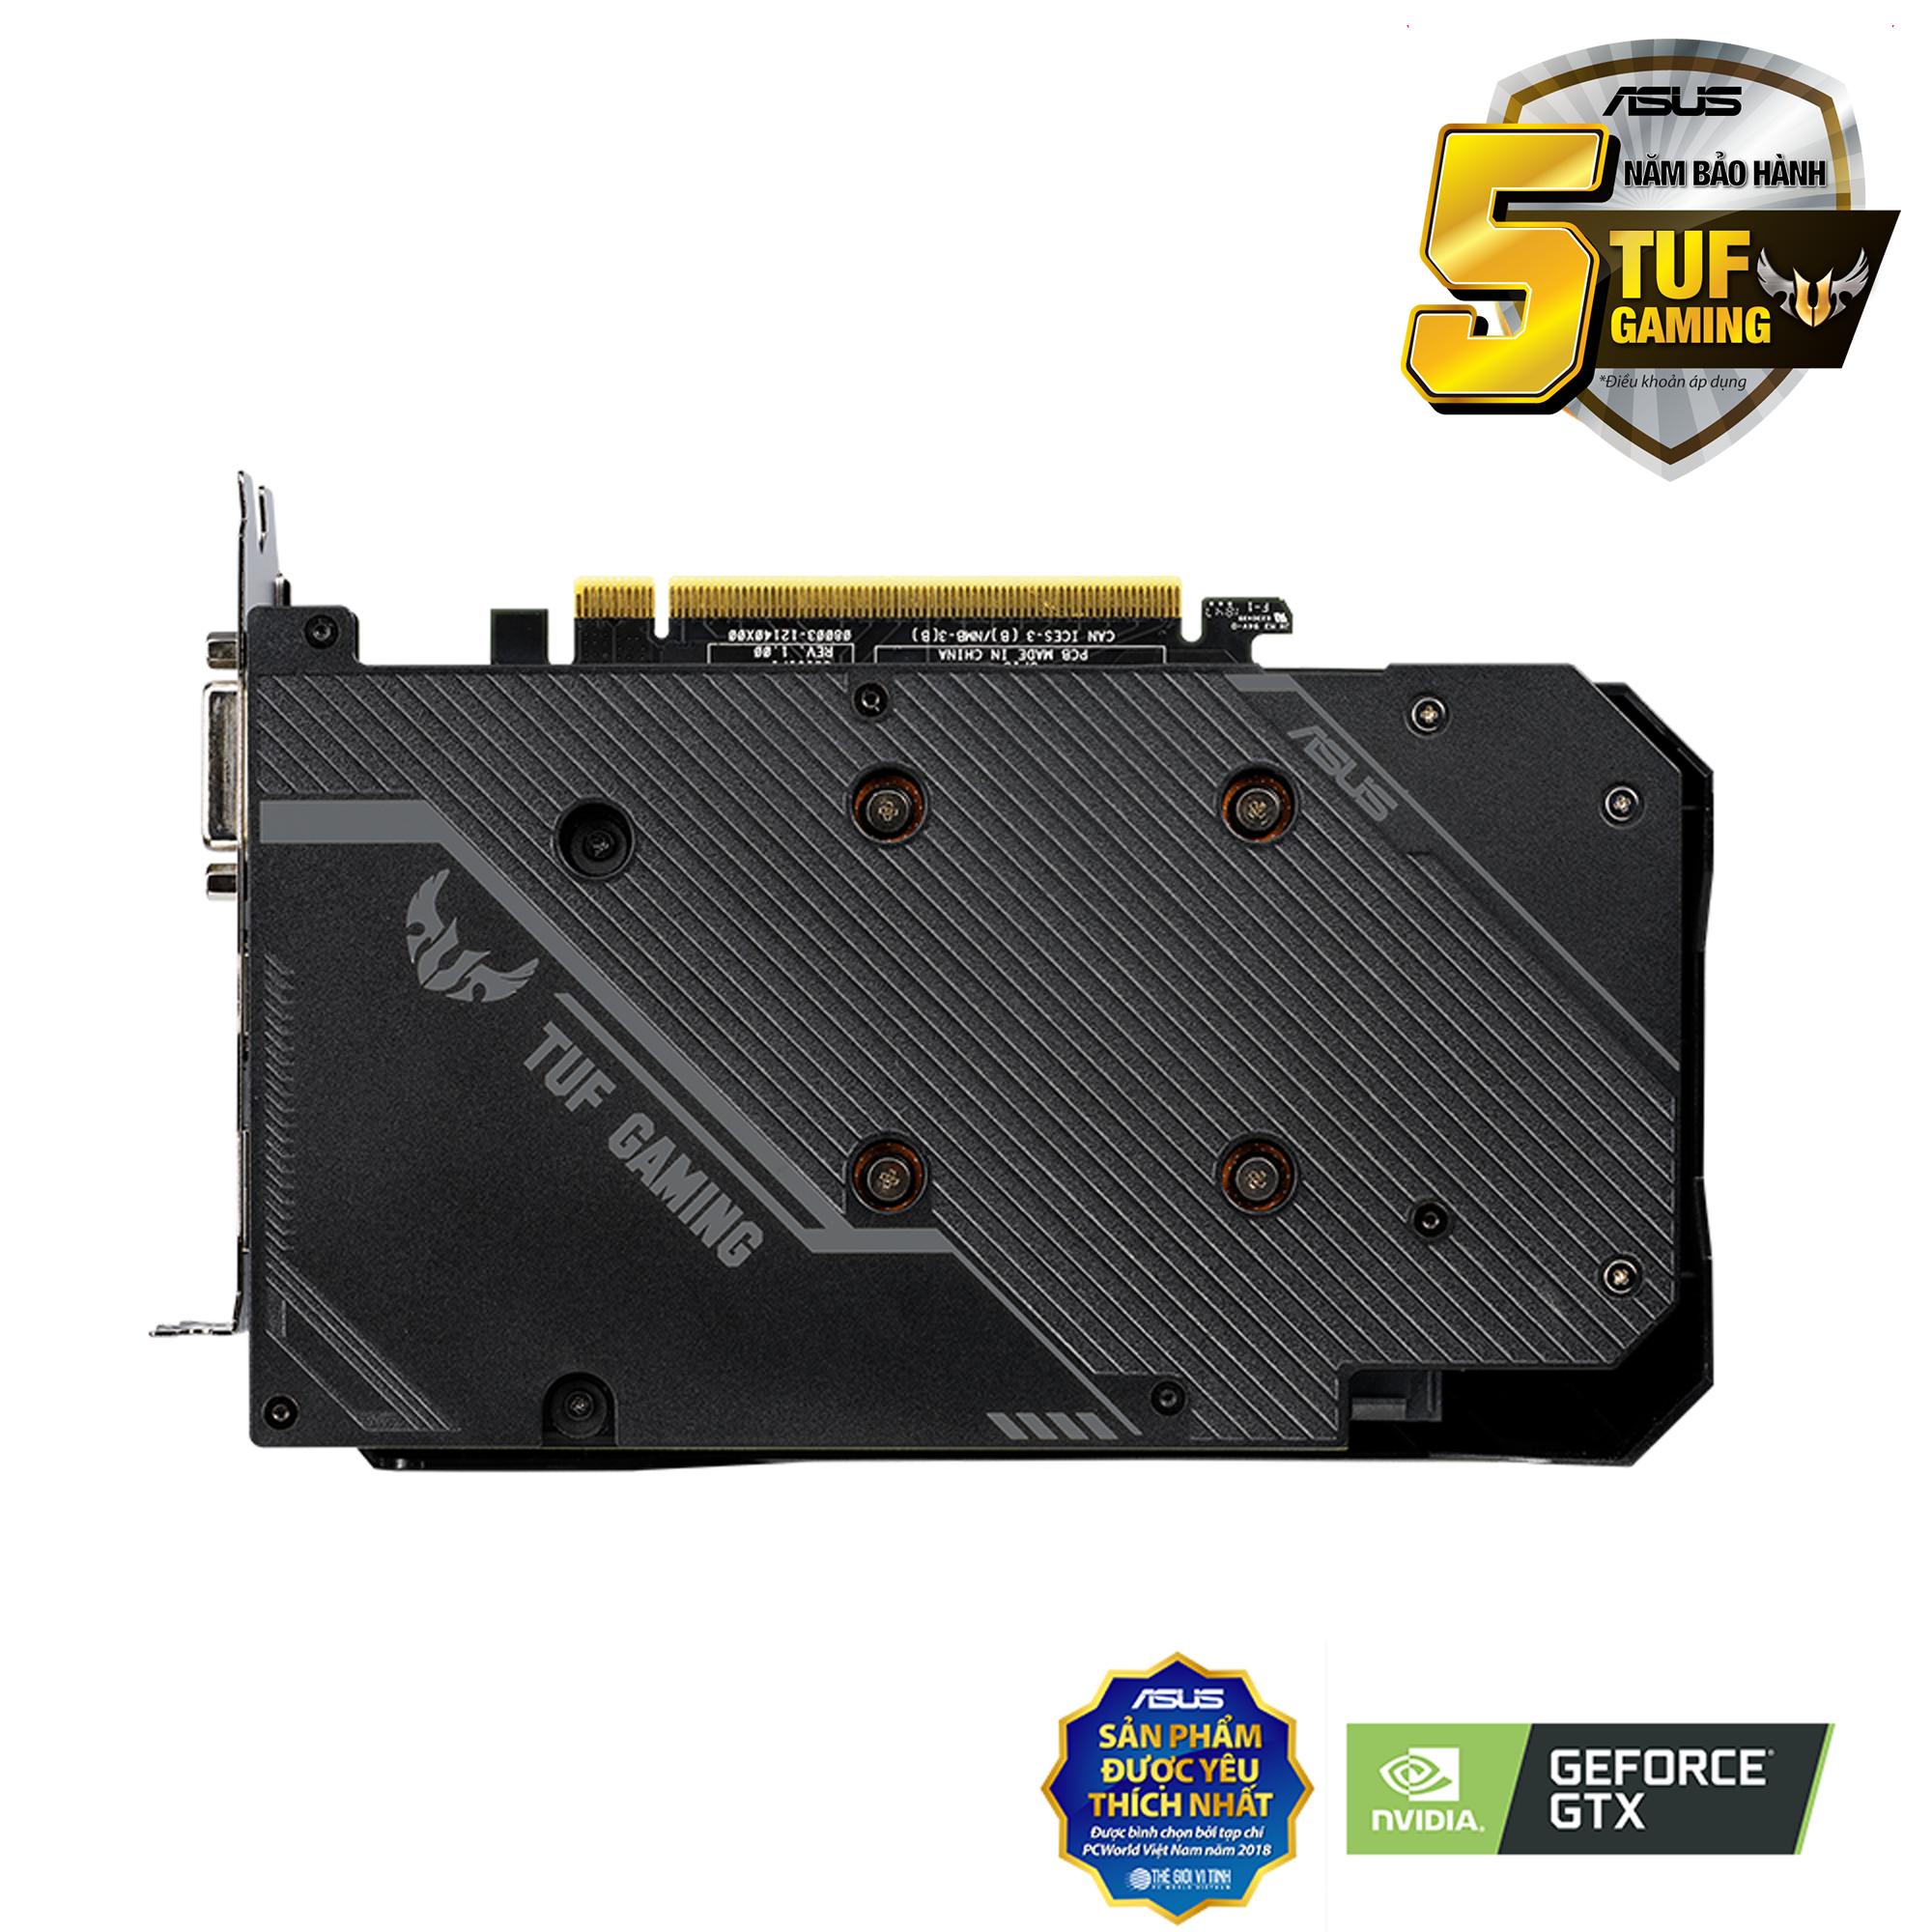 ASUS TUF GTX 1660 OC edition 6G Gaming GDDR5